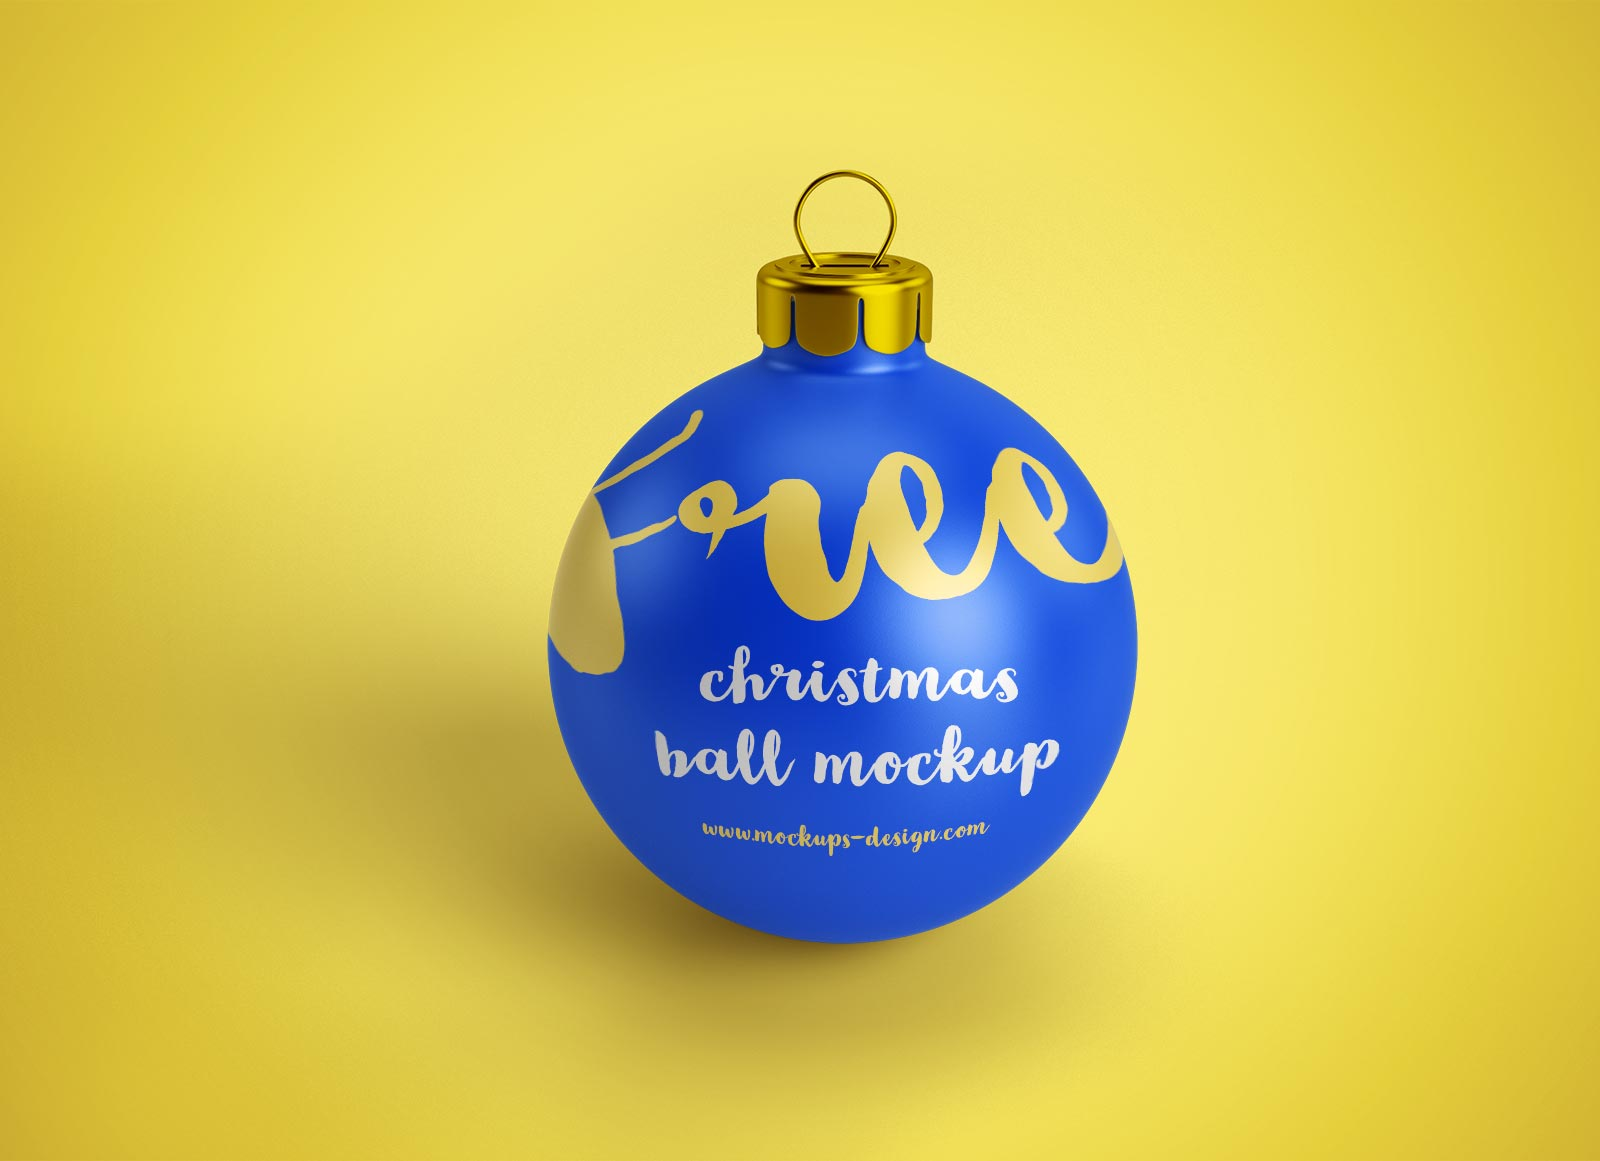 free christmas ball  bauble  ornament mockup psd files